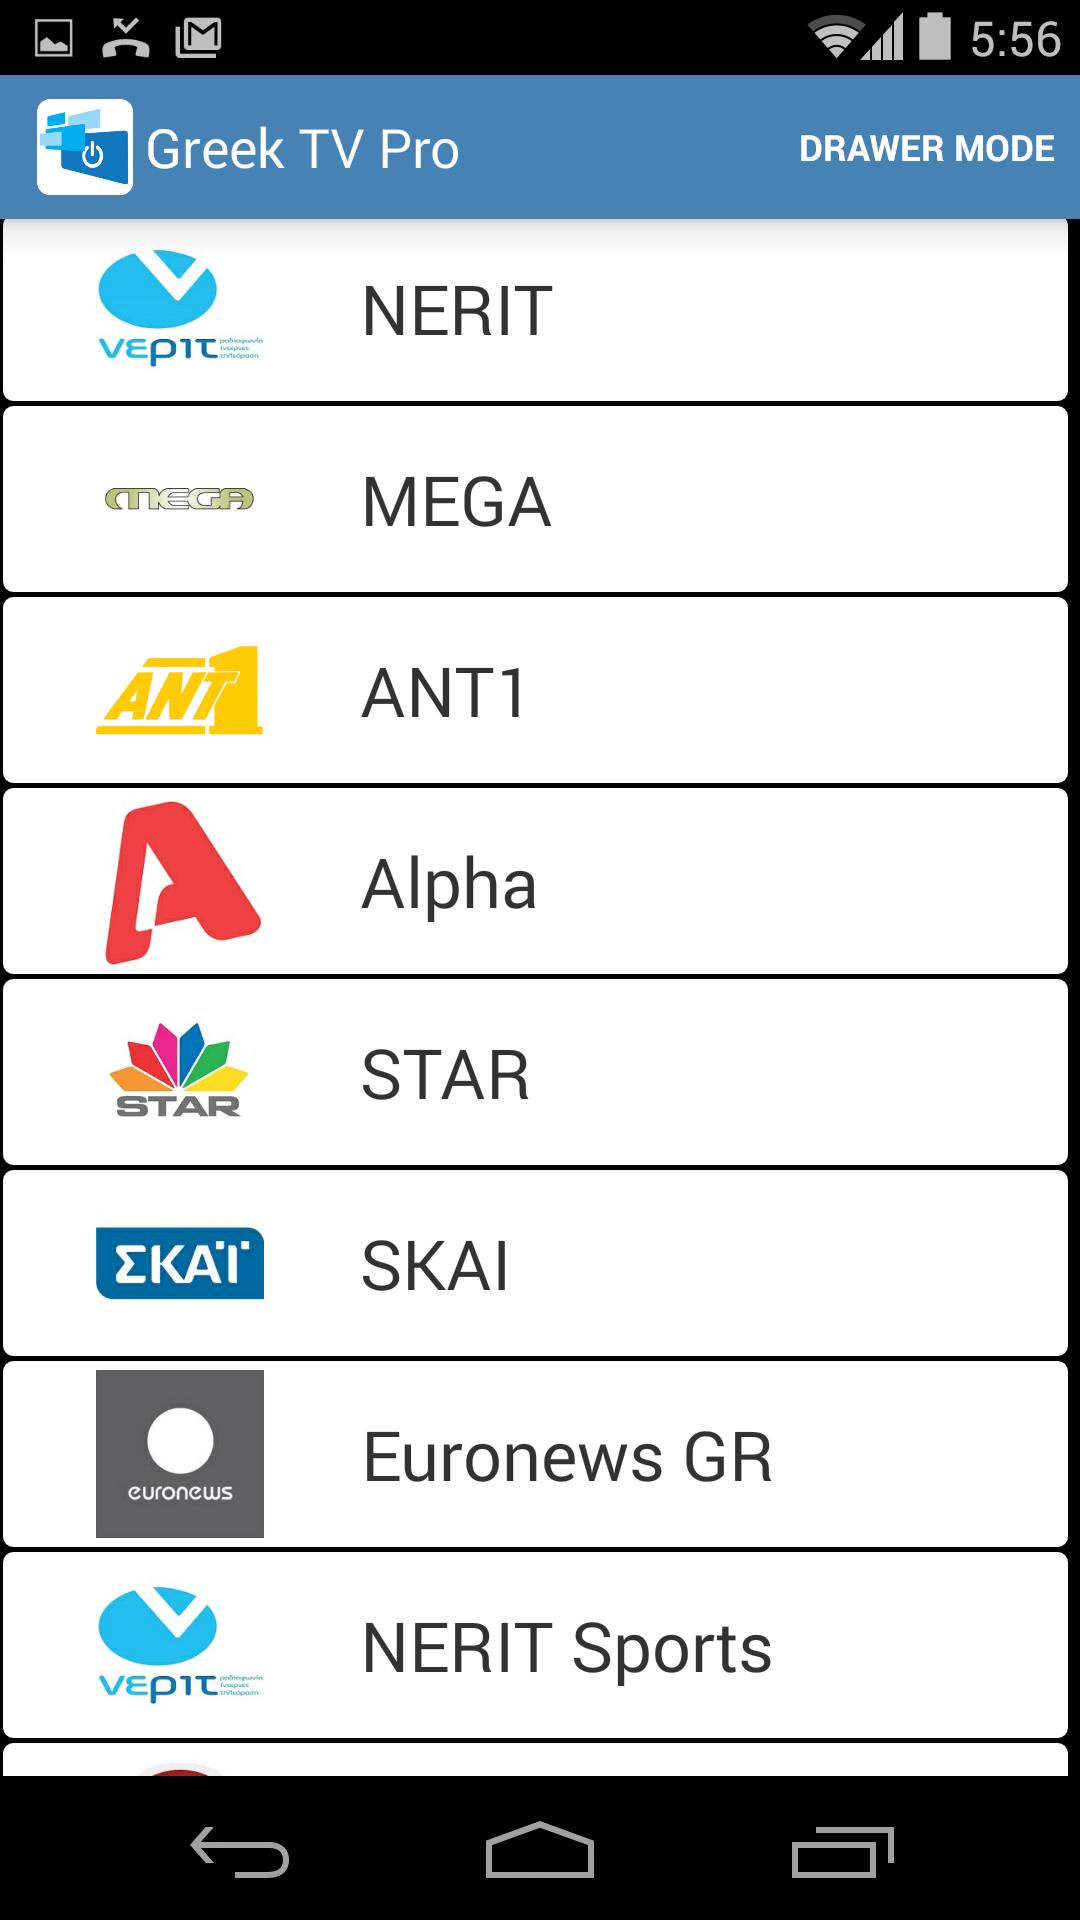 Greek TV Pro